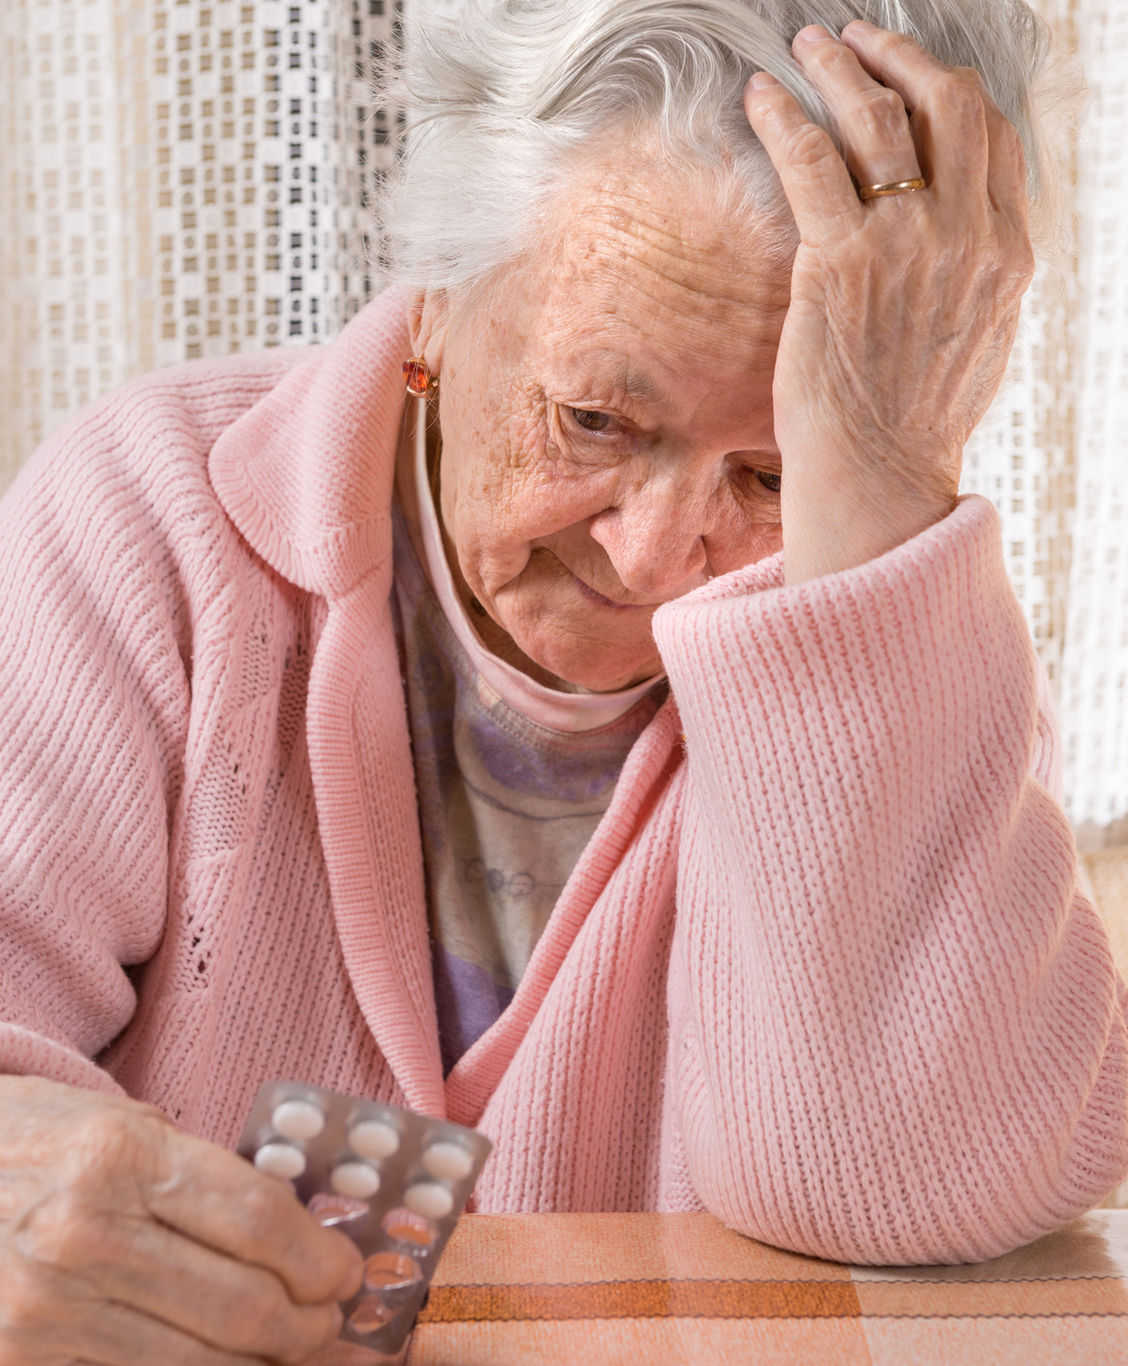 Psychopharmaka-Kombinationen: Fallstricke in der Beratung